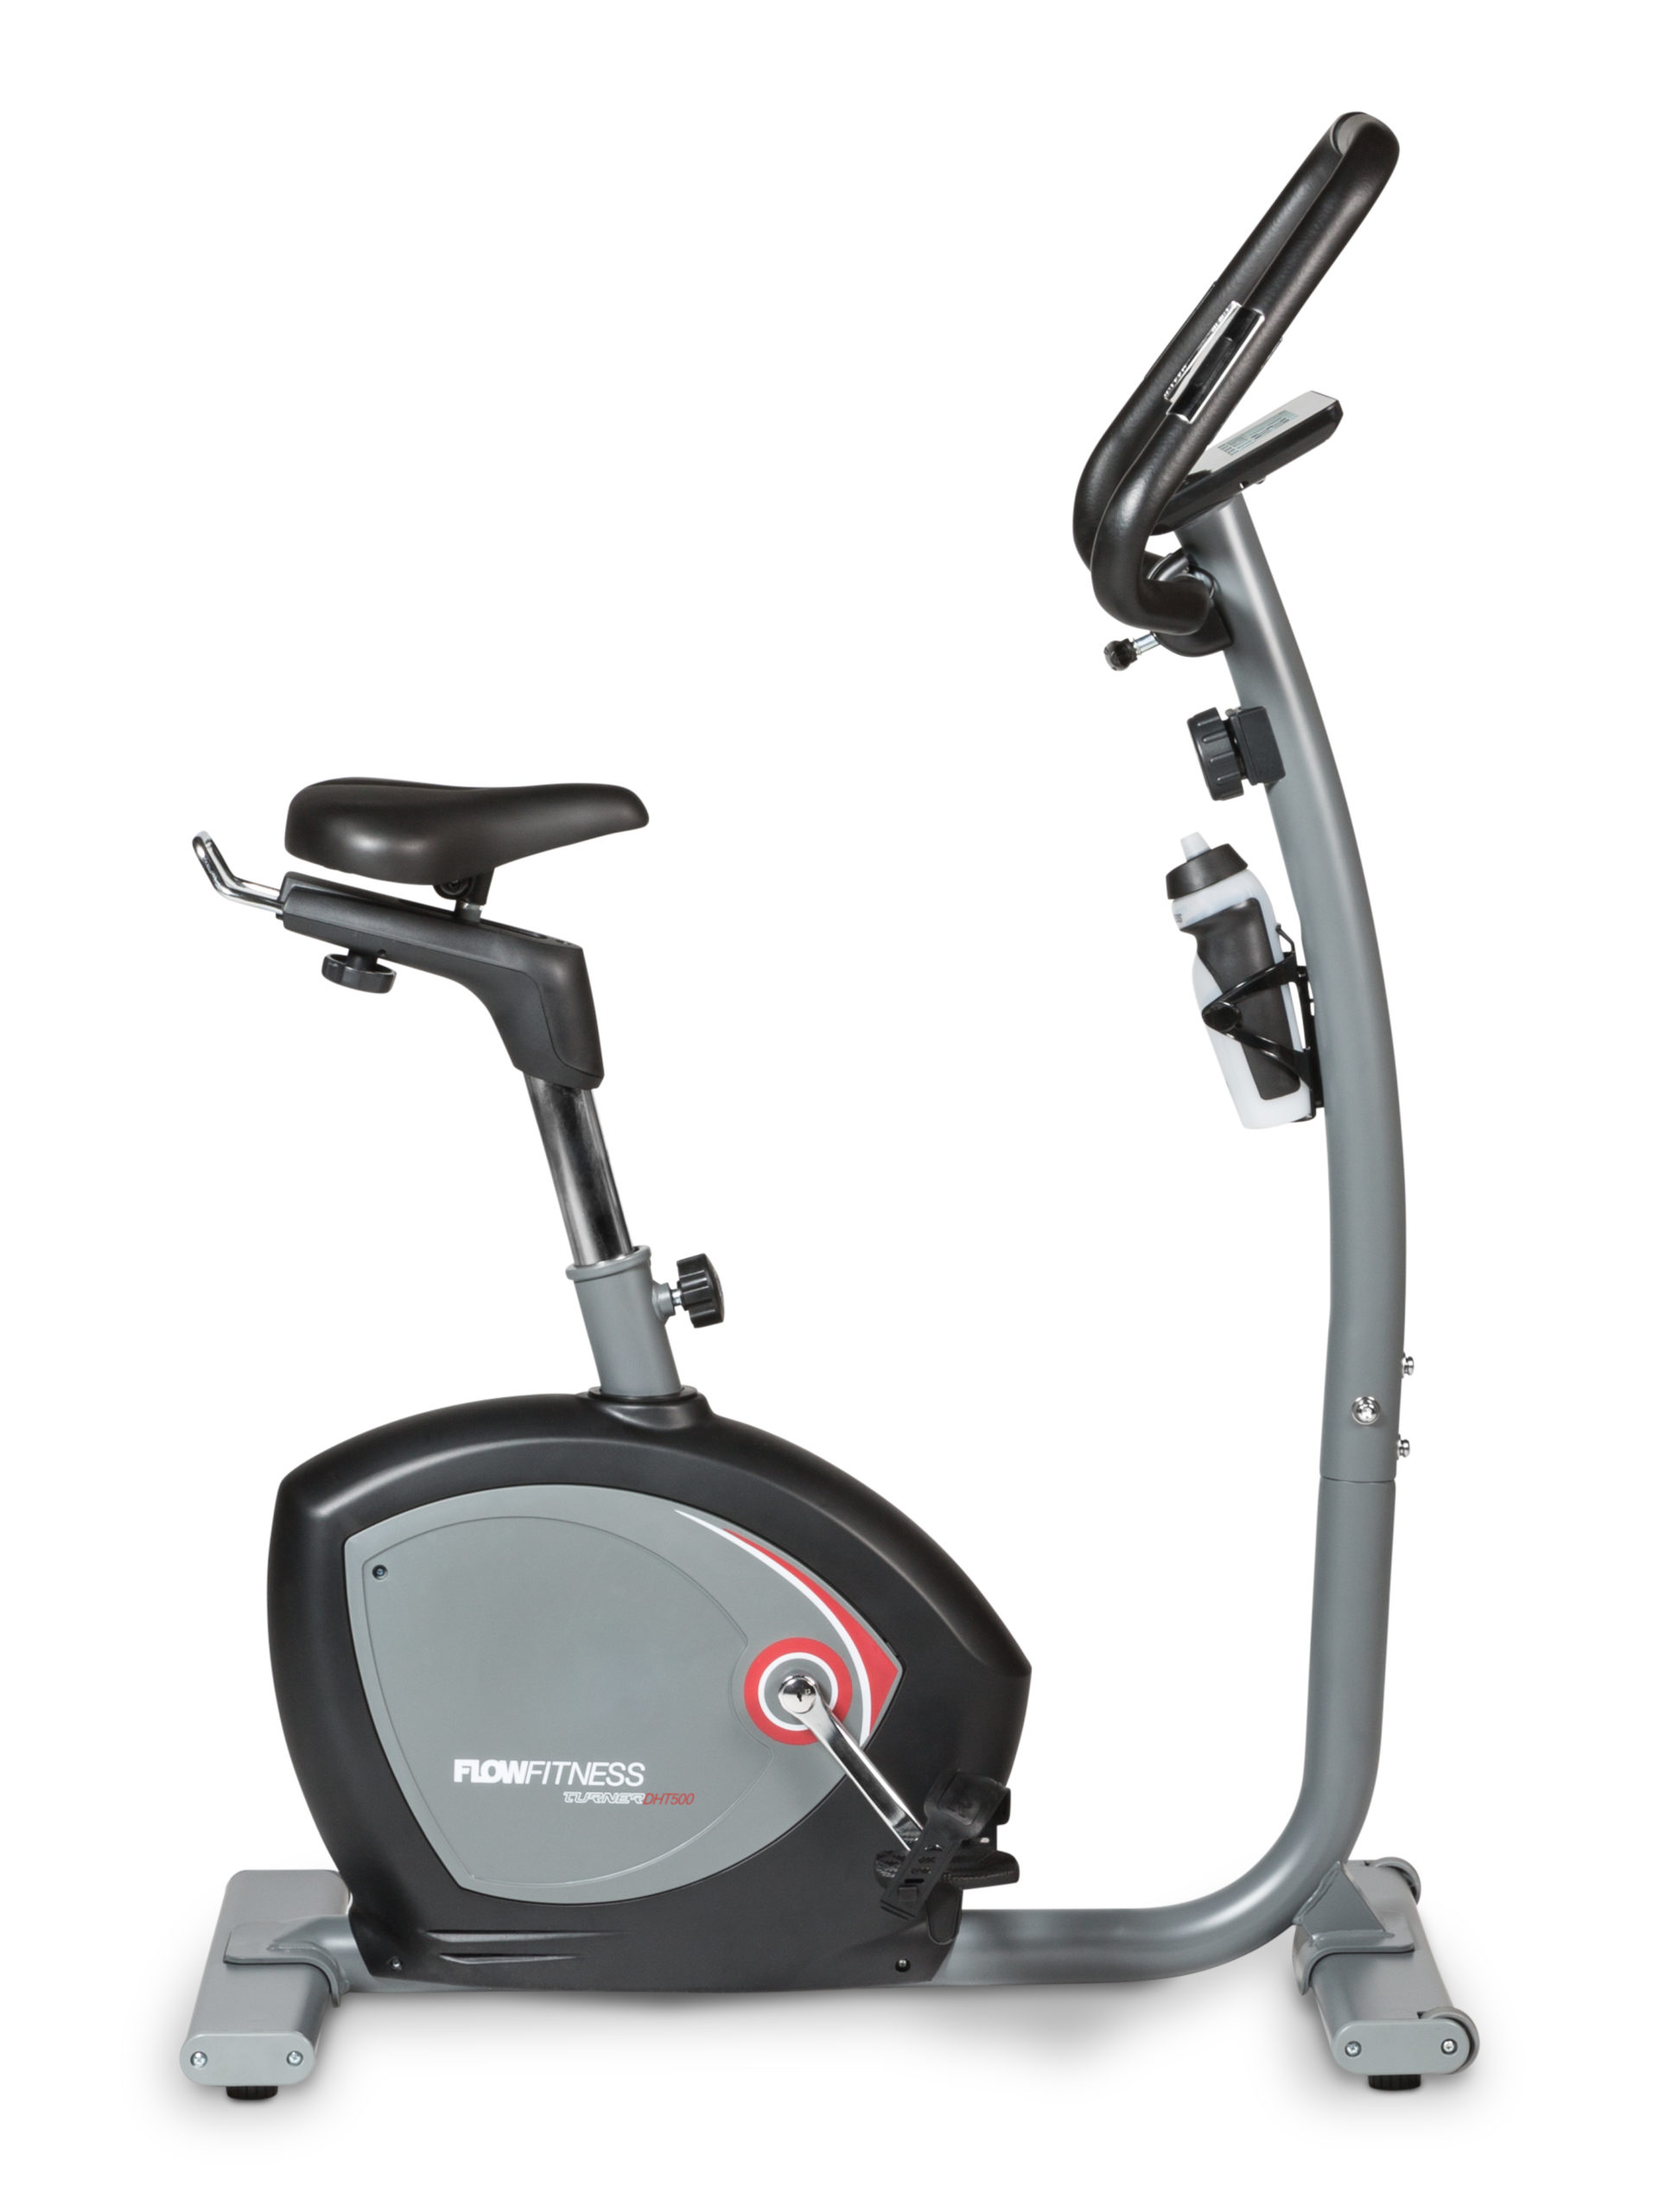 Flow Fitness Tabel Turner DHT500 Hometrainer 19